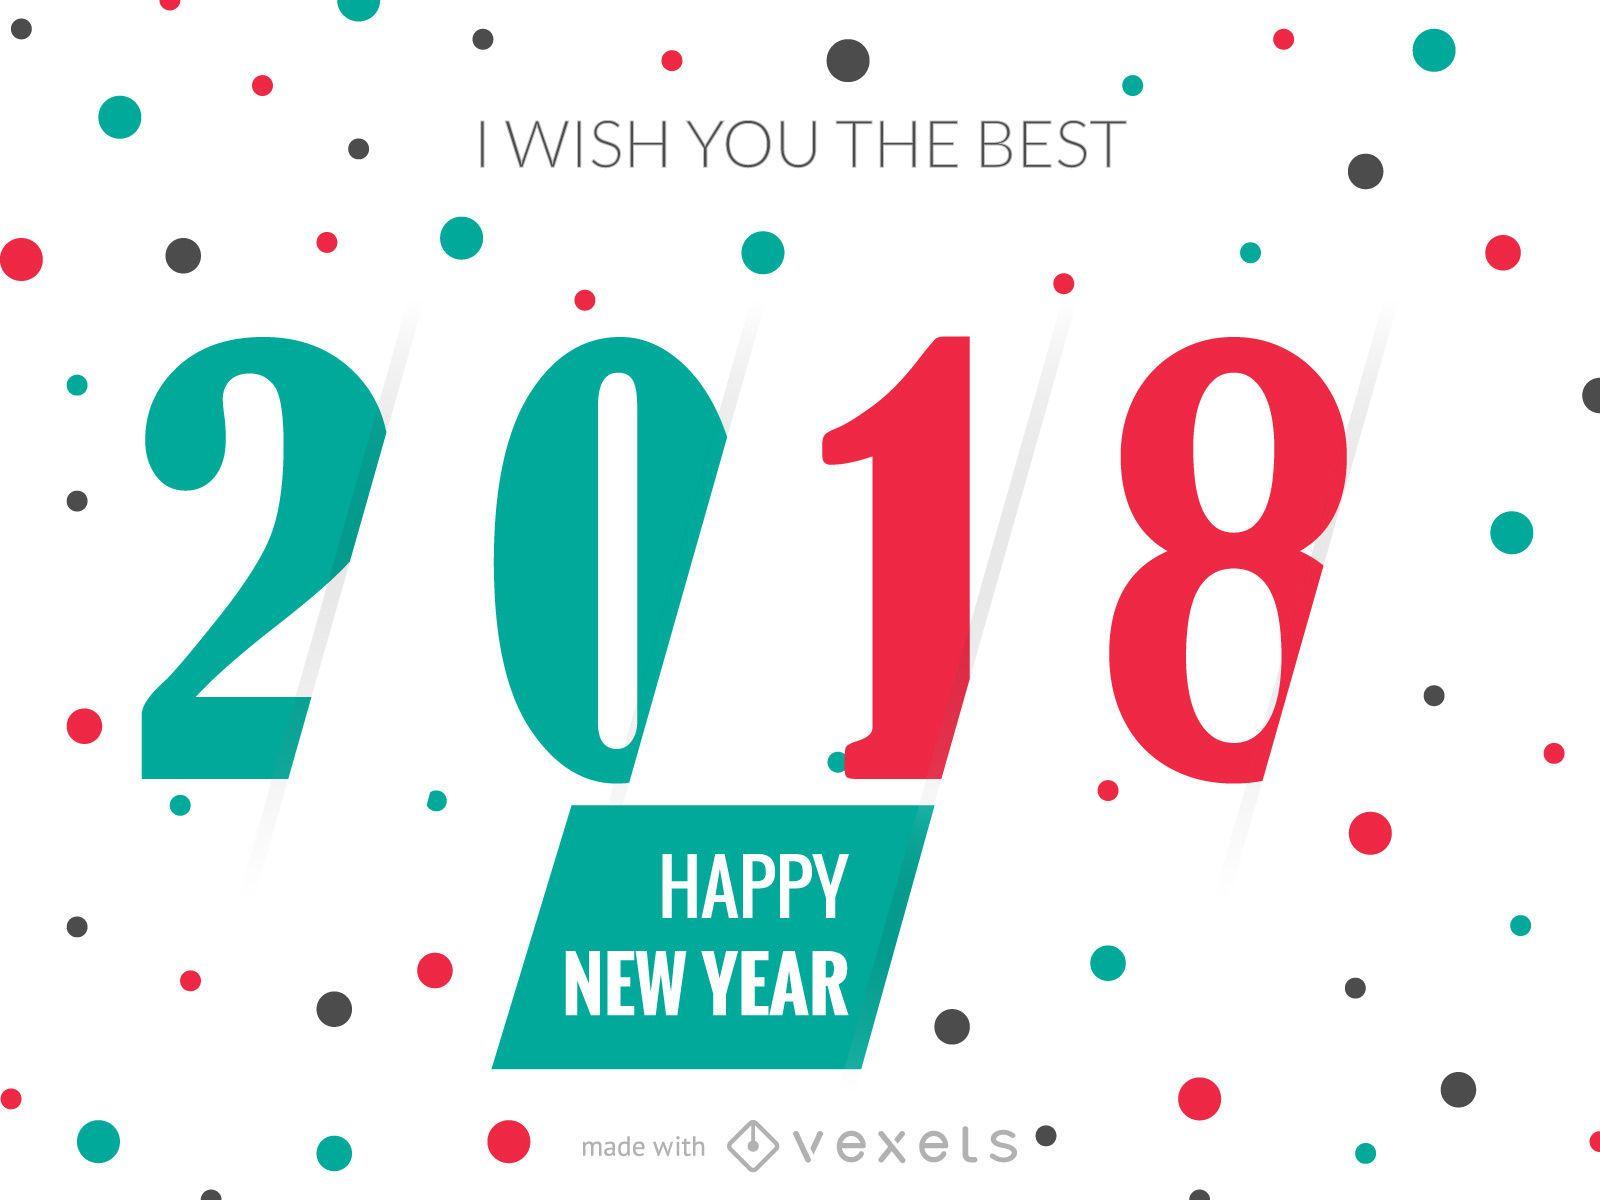 2018 New Year greeting card maker - Editable design